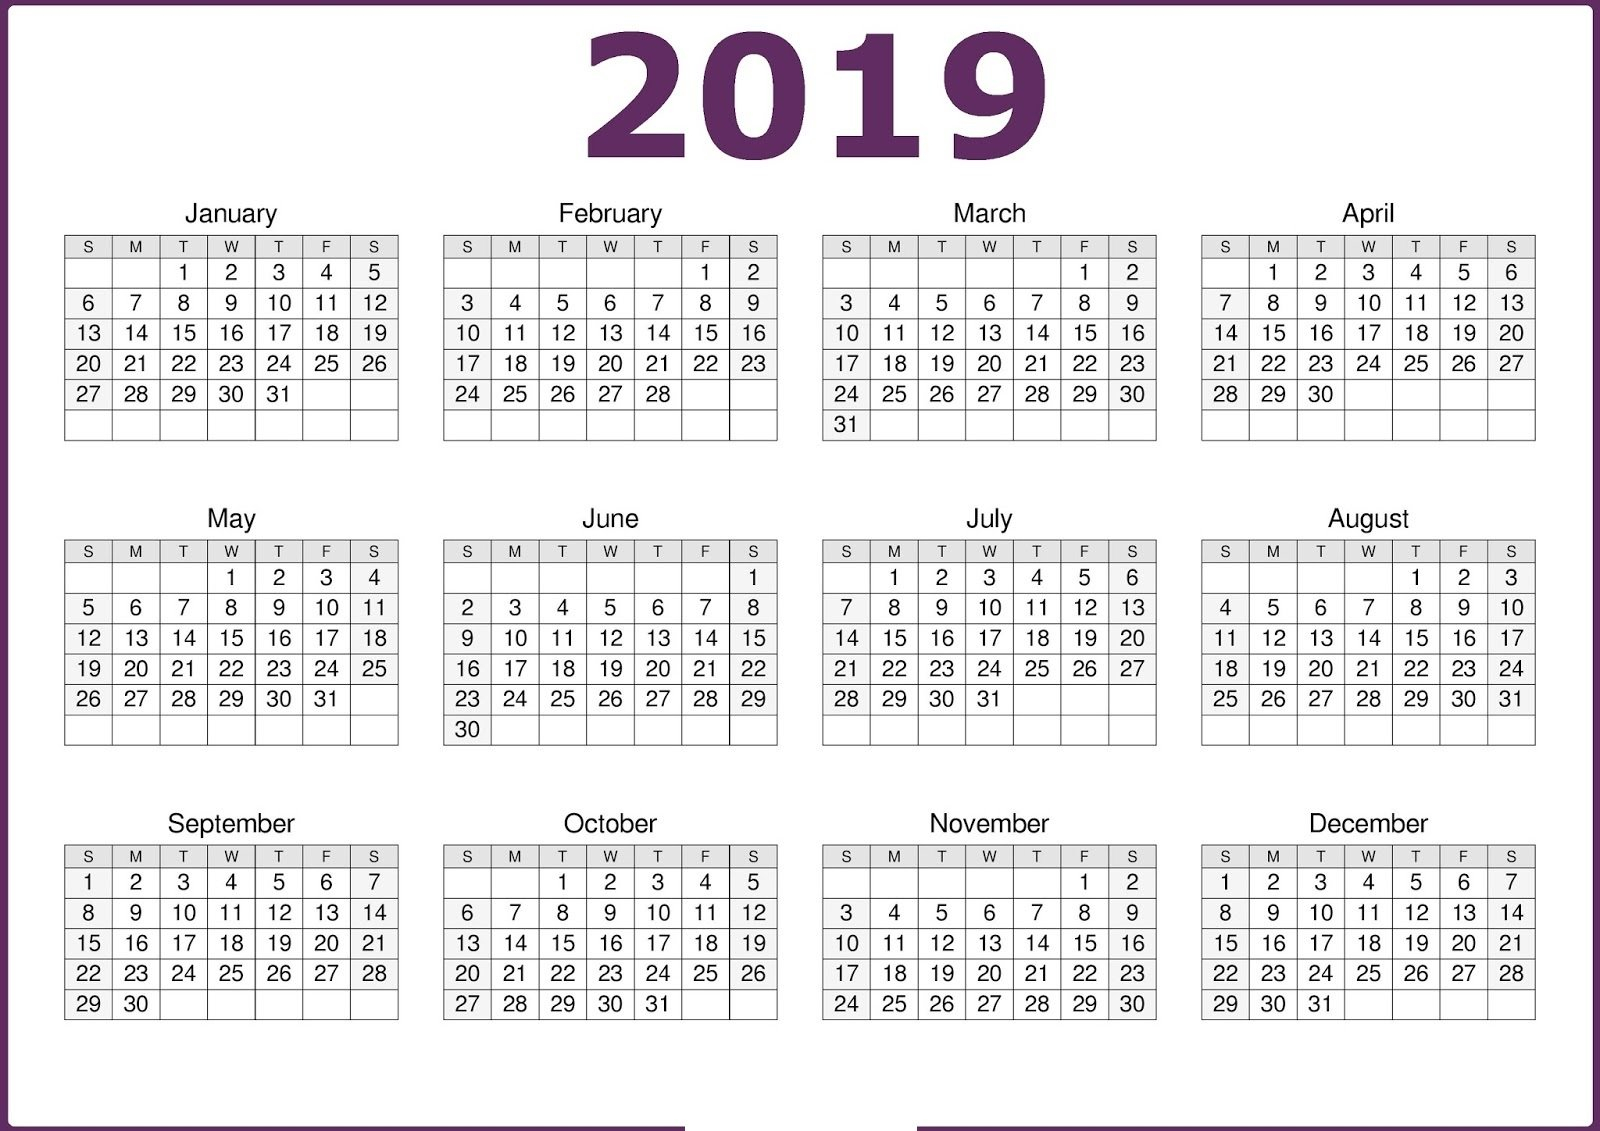 Calendar 2019 Pdf (1) | Download 2019 Calendar Printable With Calendar 2019 Pdf Free Download